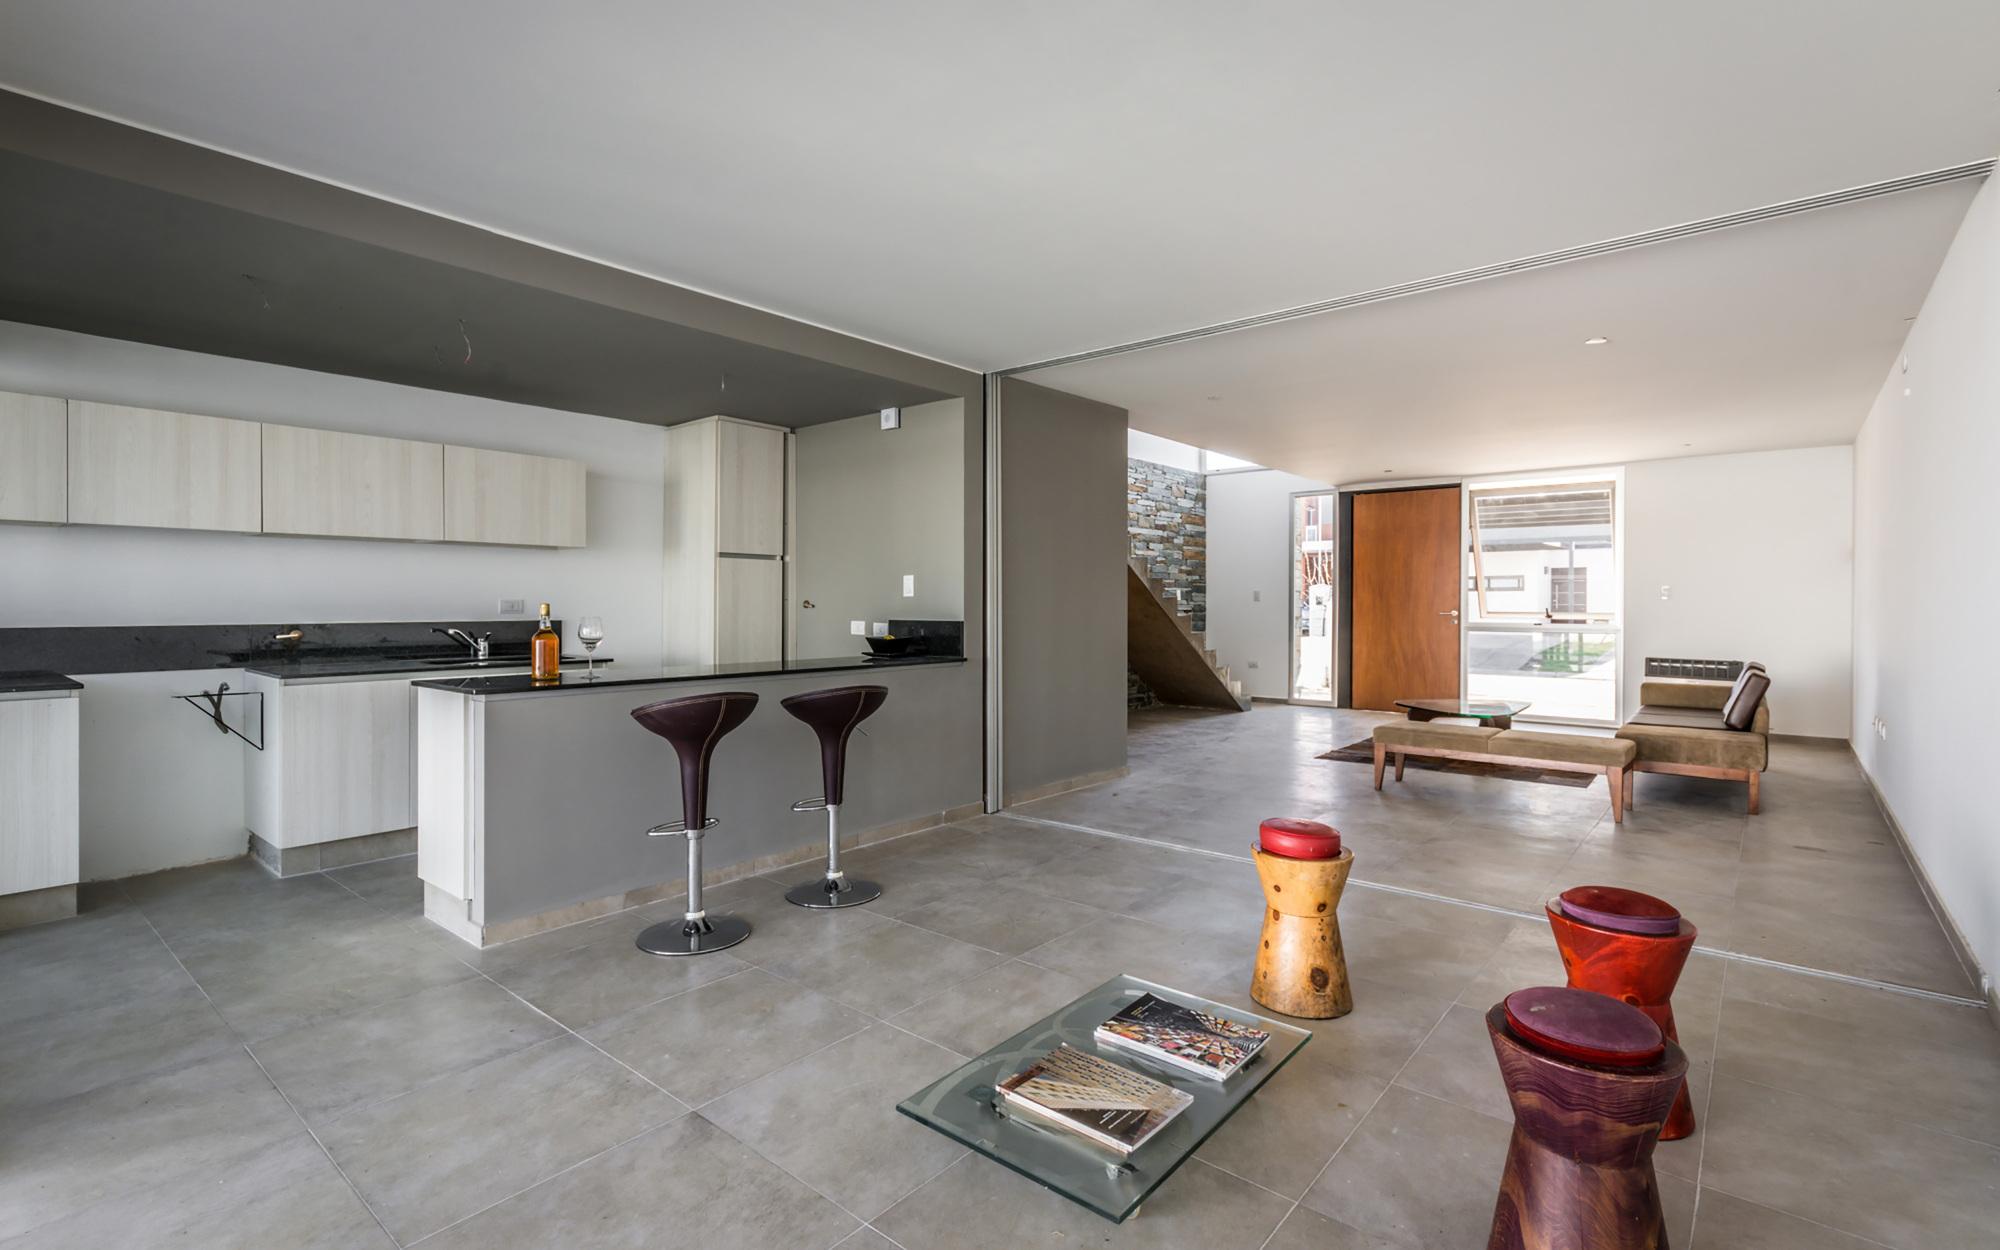 Galeria de casas geminadas estudio a 3 13 for Diseno de pisos interiores